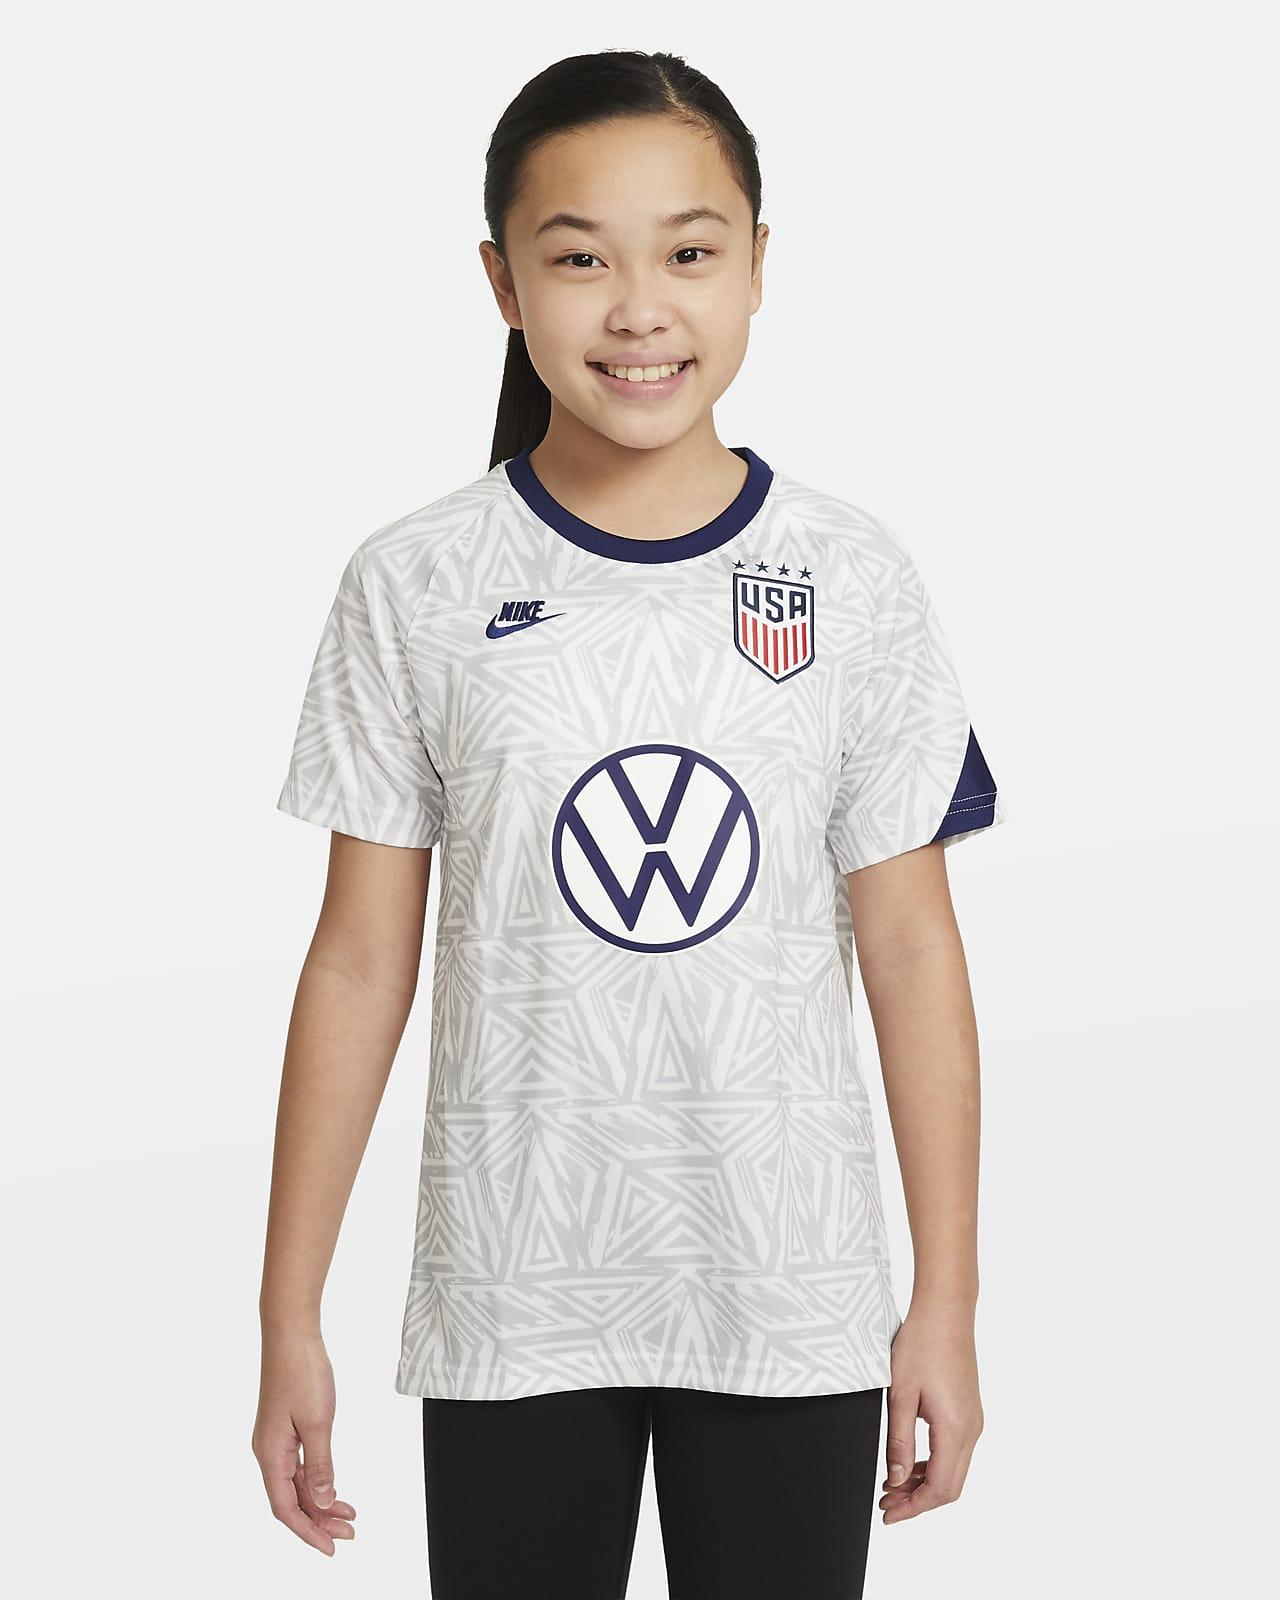 U.S. Big Kids' Pre-Match Short-Sleeve Soccer Top